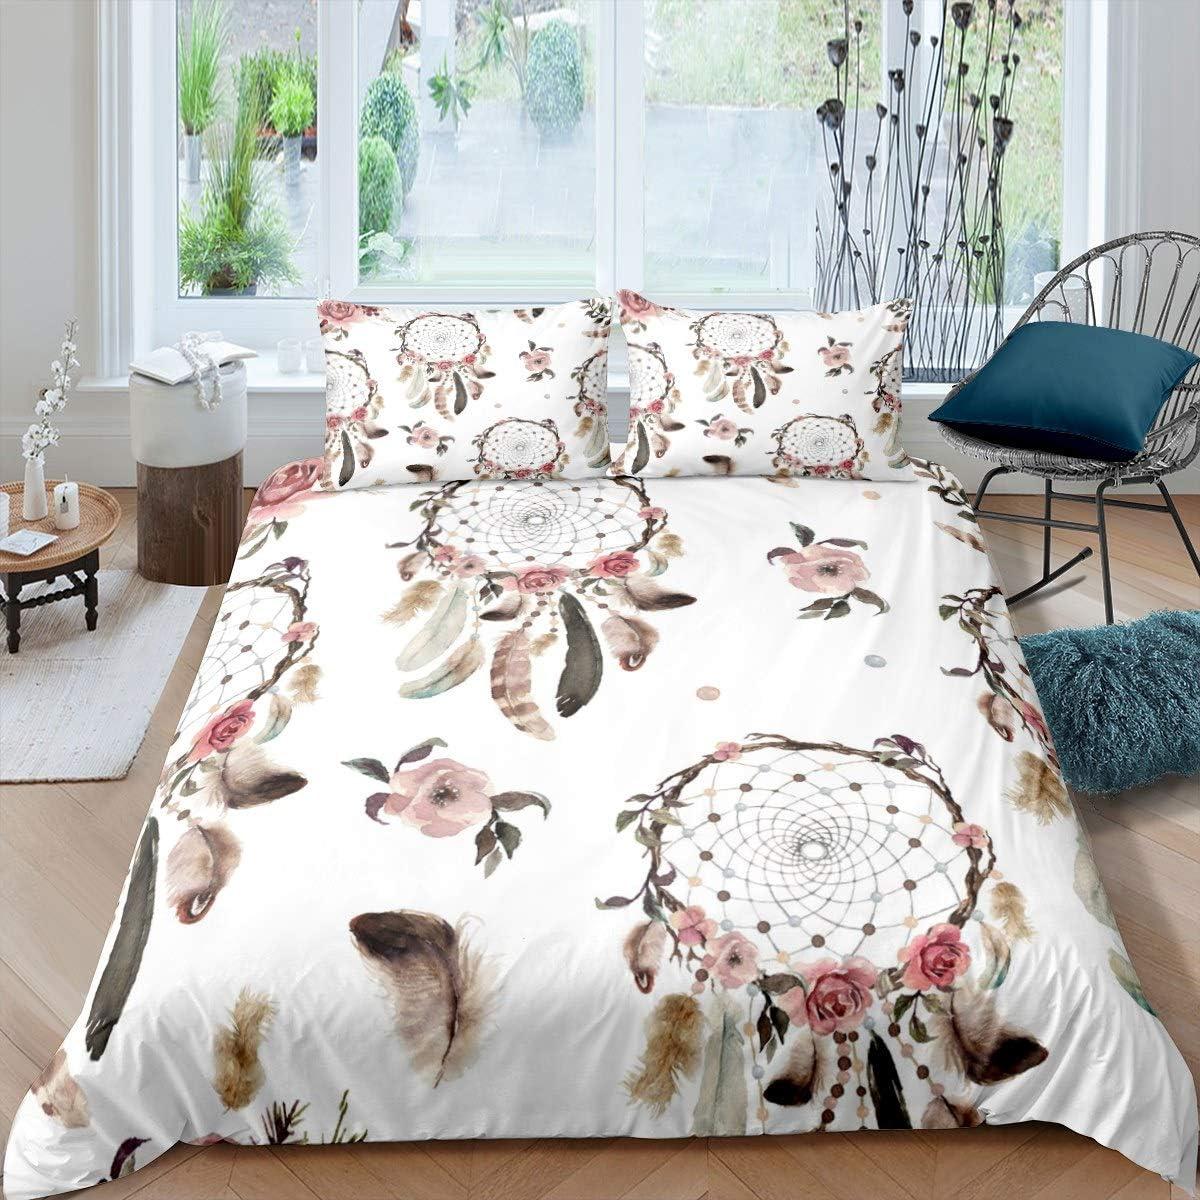 New mail order Dreamcatcher Bedding Set for Girls Catcher Women Nashville-Davidson Mall Dream Comf Boho